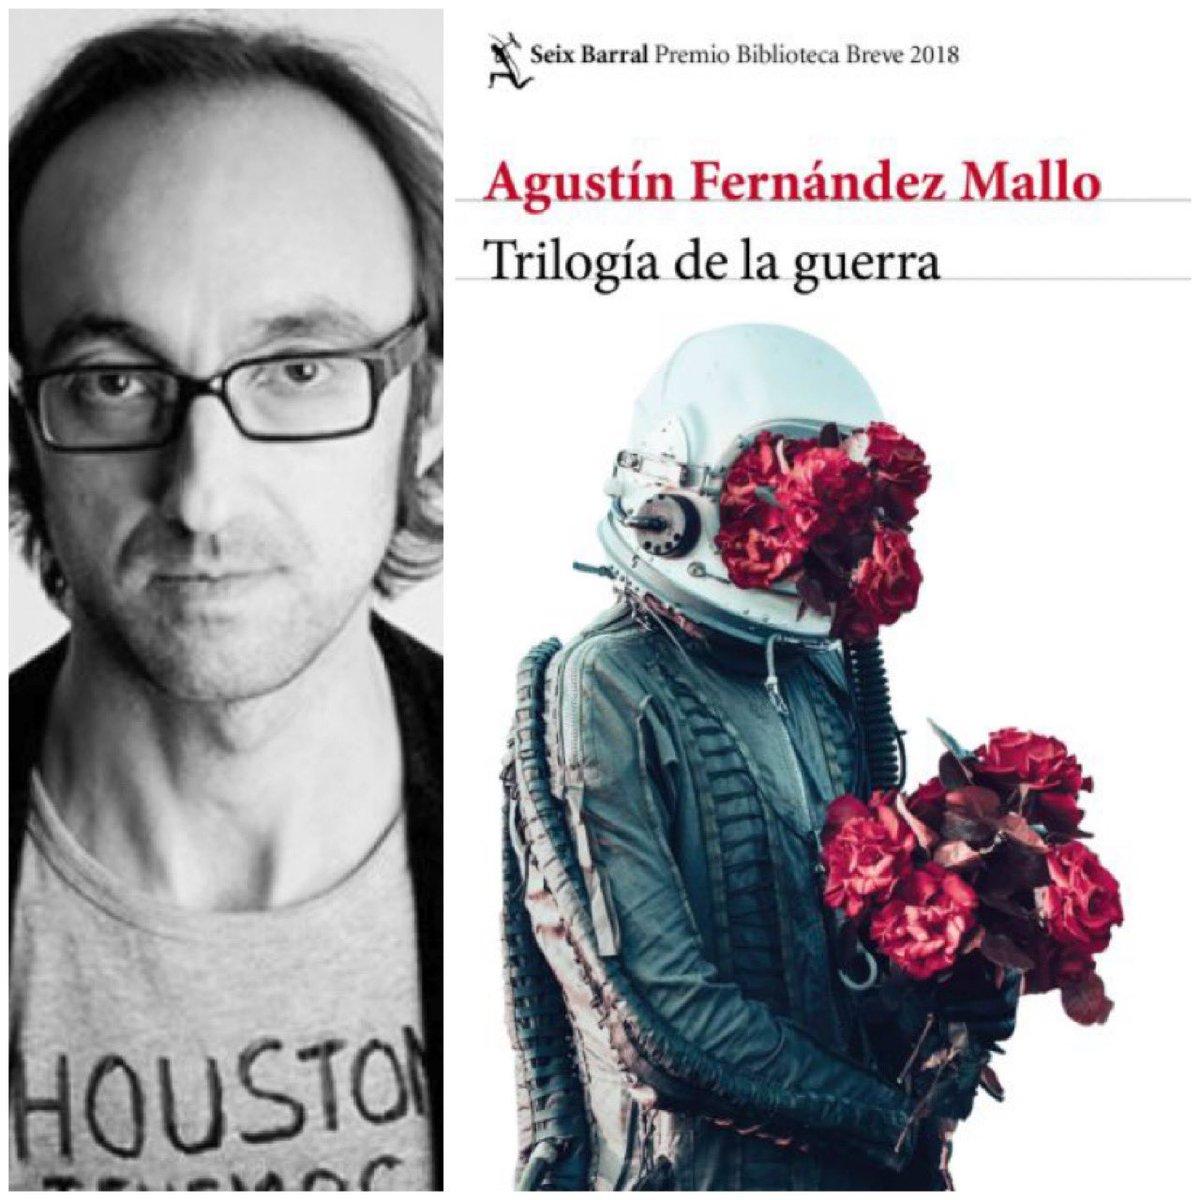 Sesión 83: 28 sep 2019 Elector : @LuisCuauh  Libro: #TrilogiaDeLaGuerra     Autor : #AgustinFernandezMallo